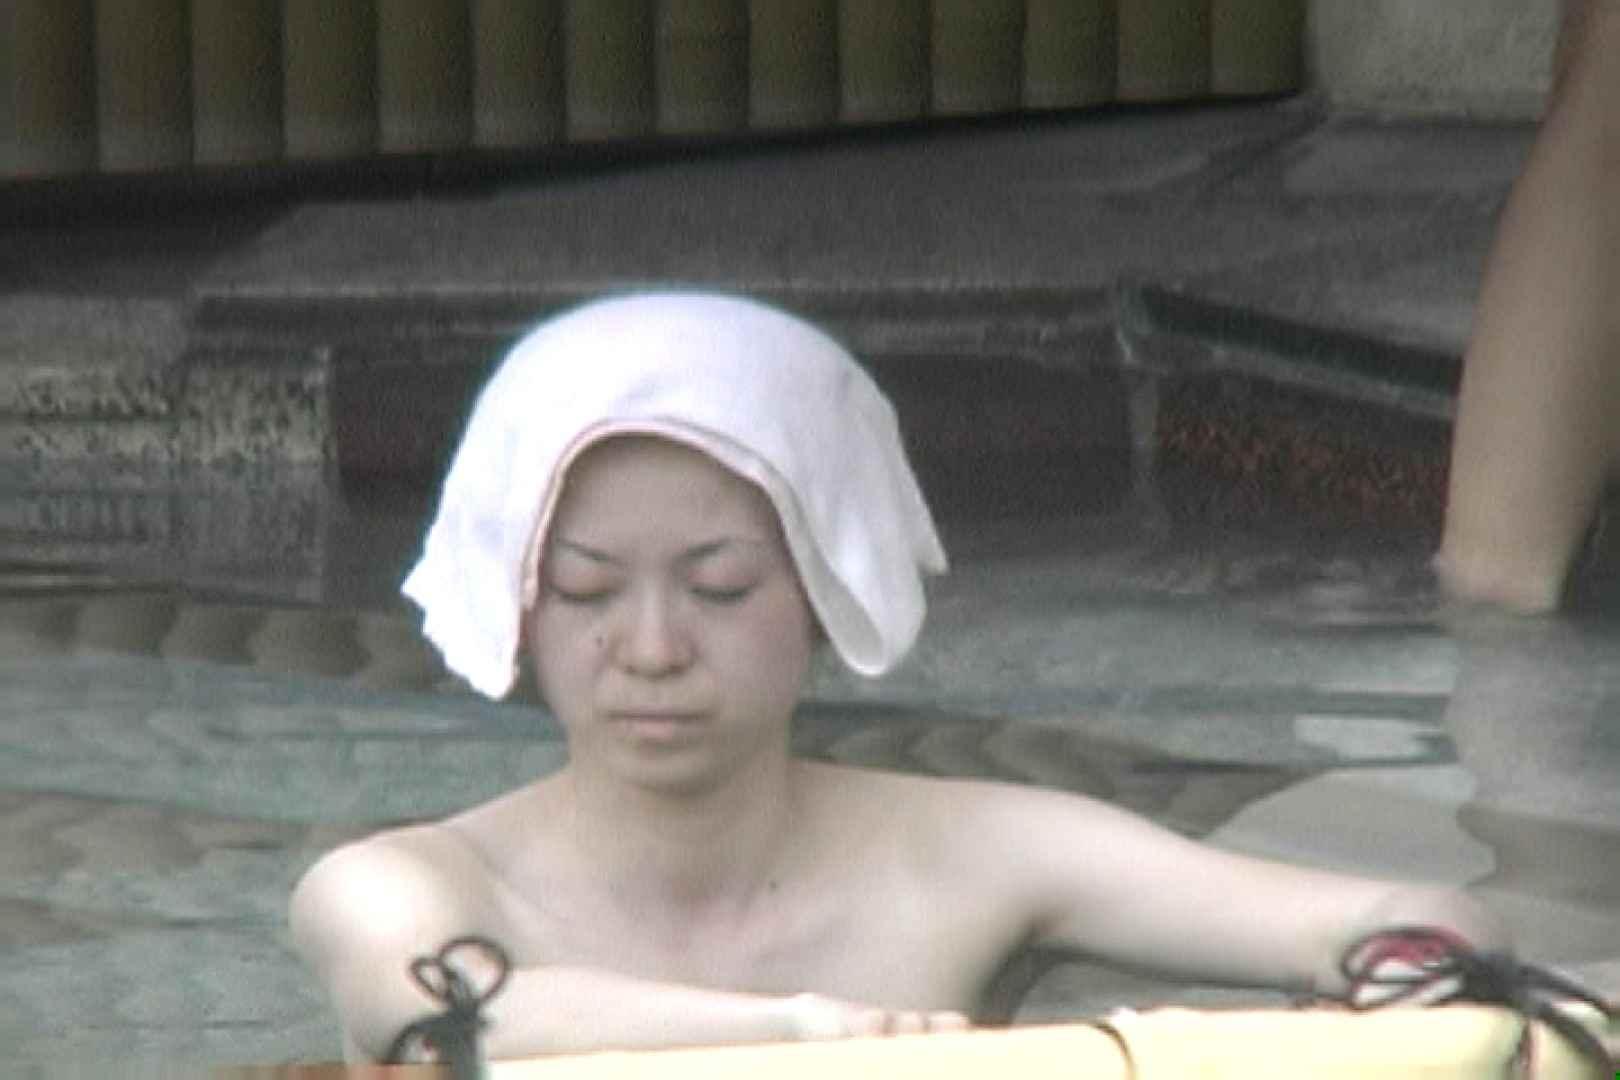 Aquaな露天風呂Vol.693 露天 | HなOL  76pic 19